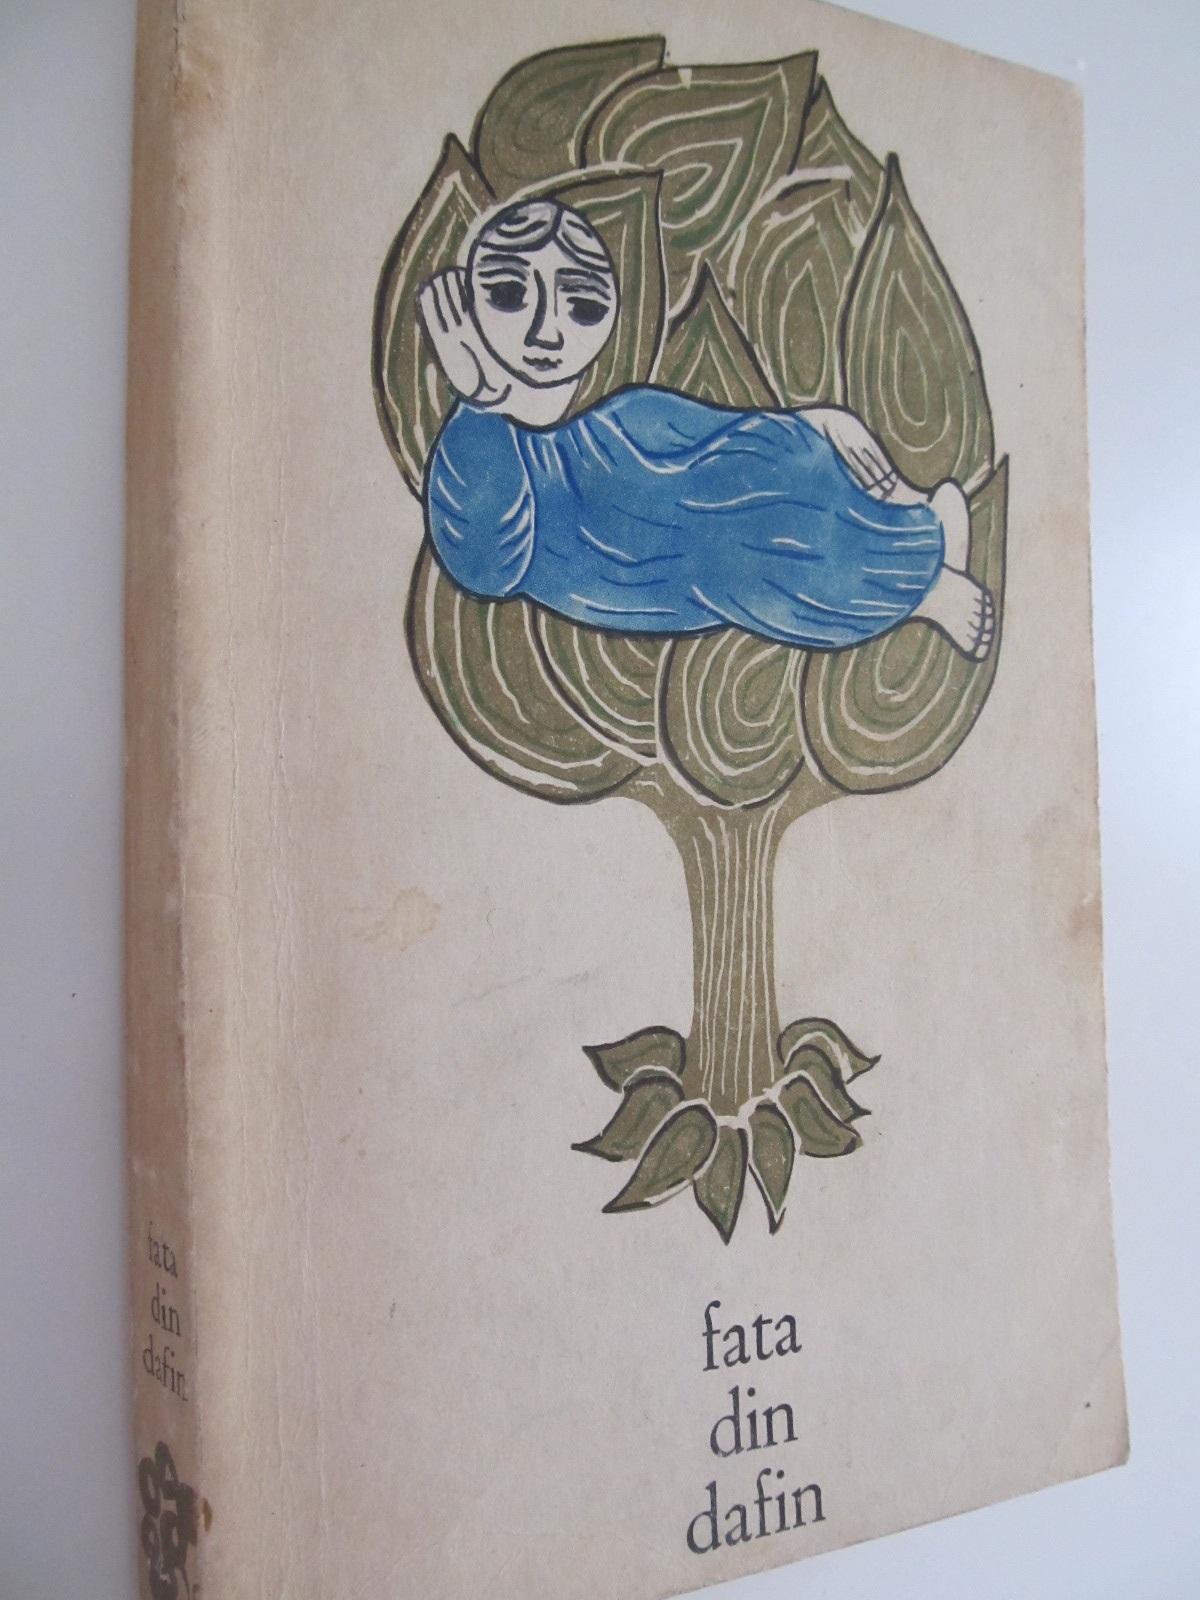 Fata din dafin - Basme populare romanesti - *** | Detalii carte